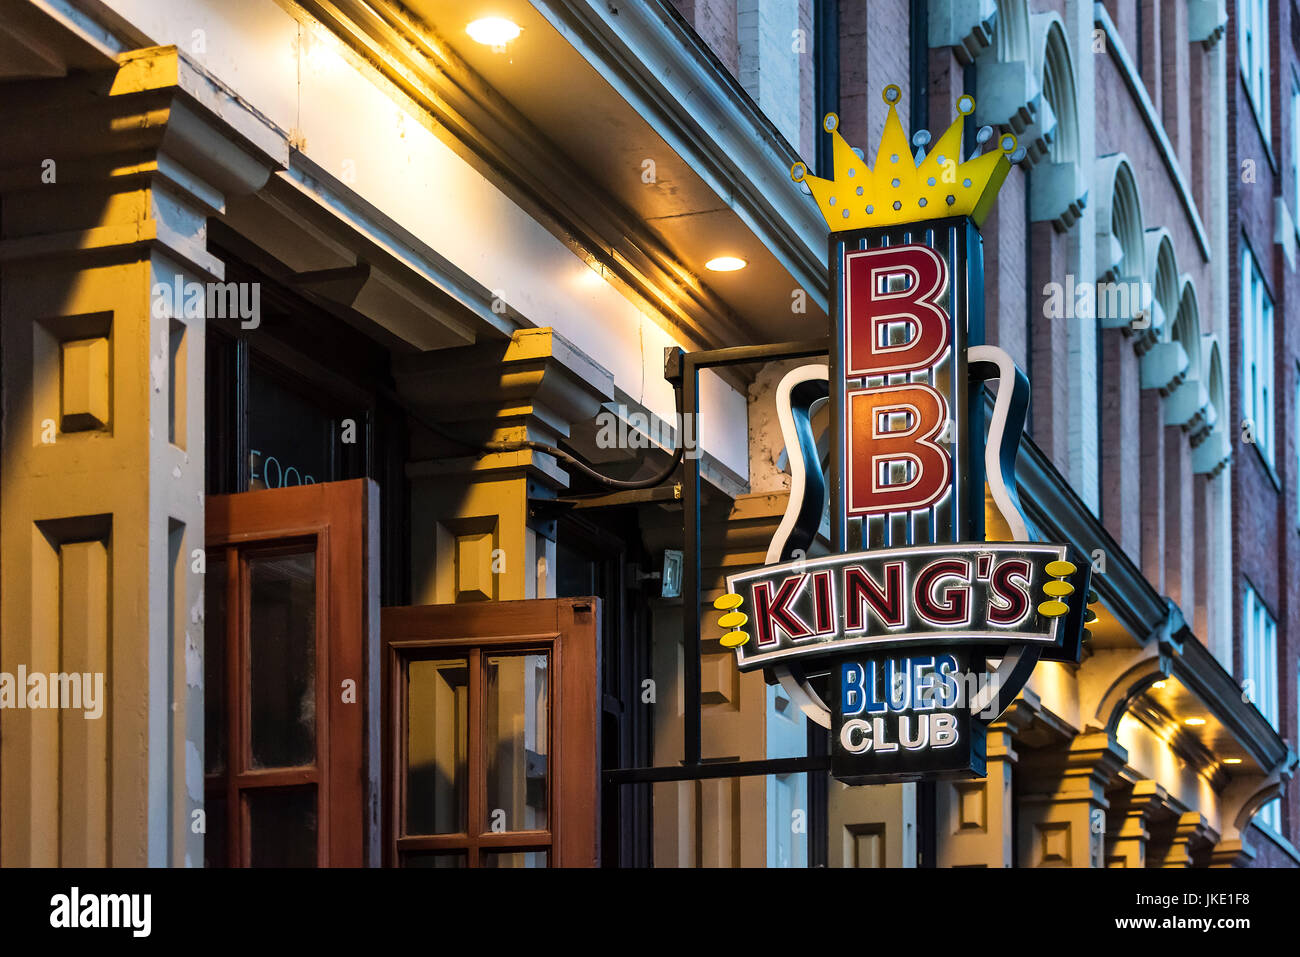 BB King's Blues Club, Nashville, Tennessee, EE.UU. Imagen De Stock